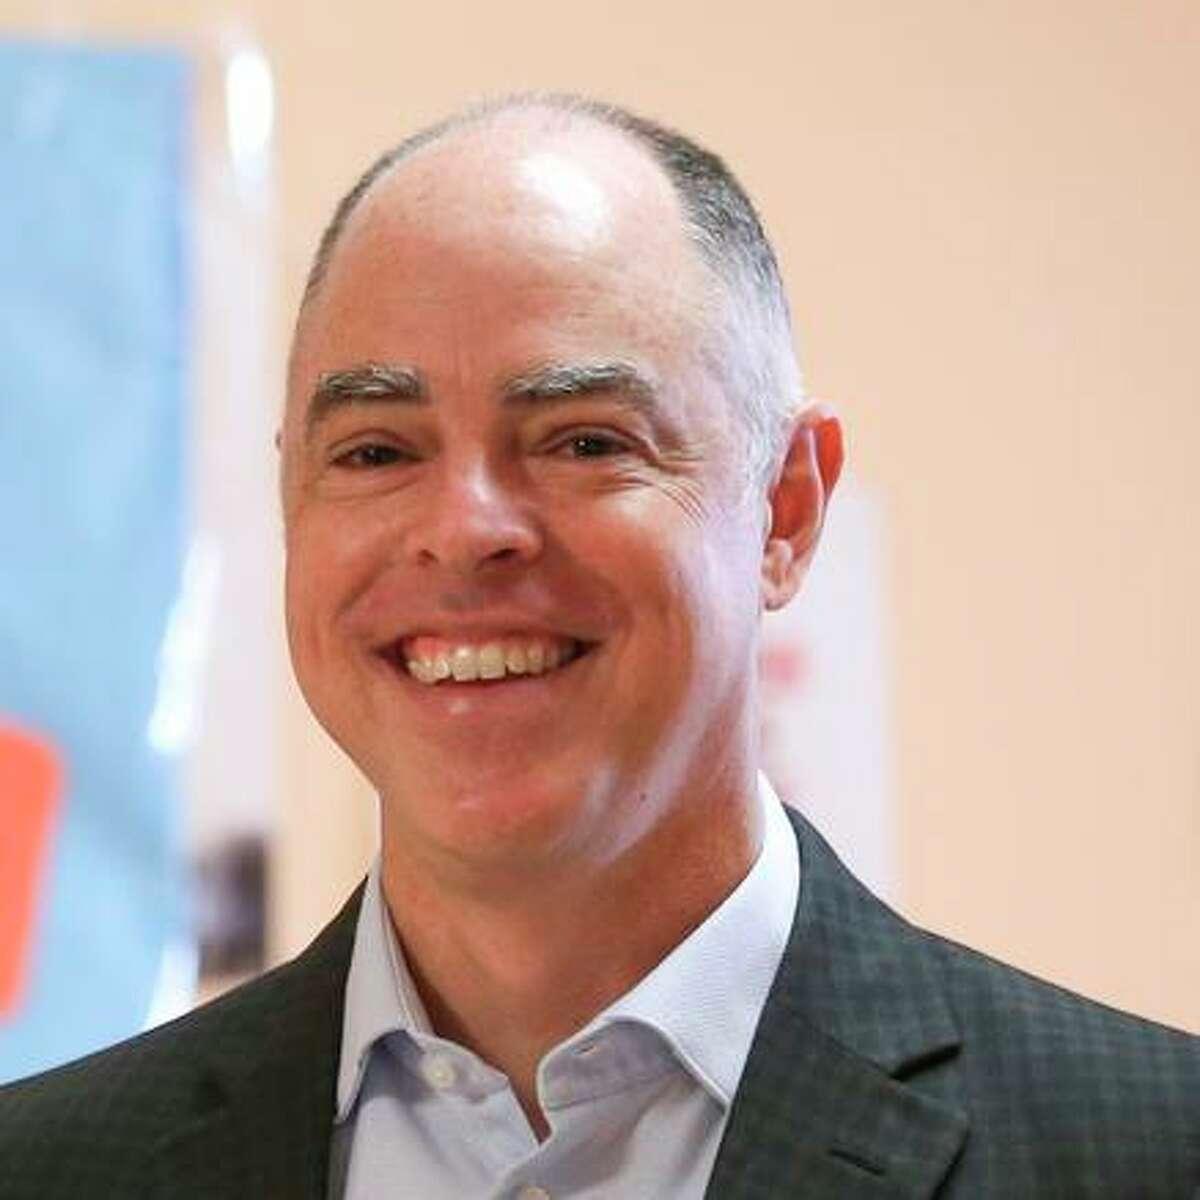 Matt Alexander, candidate for San Francisco Board of Education